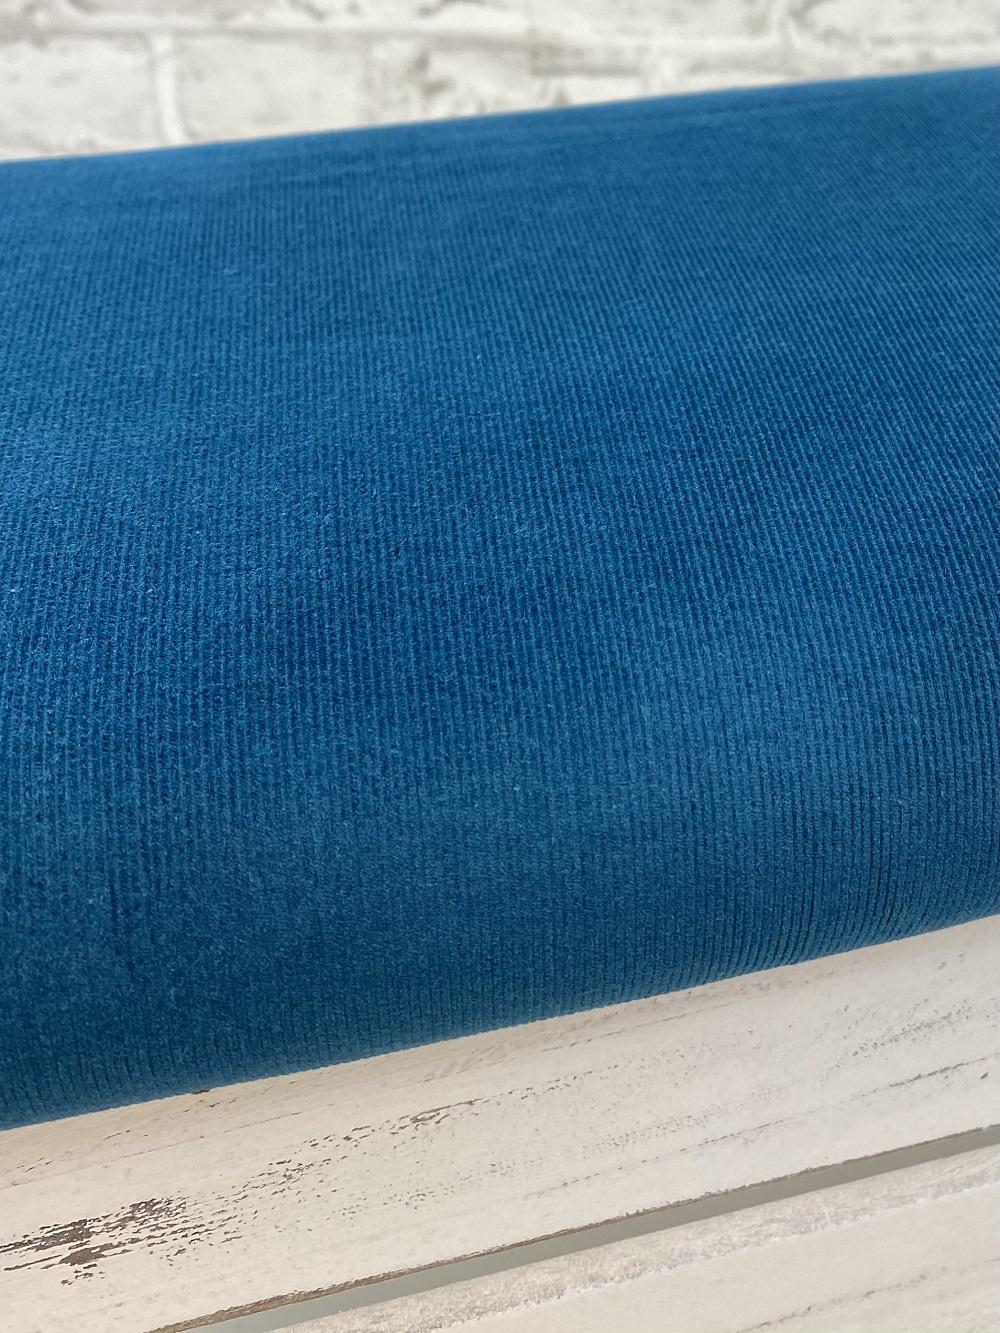 Feincord gewaschen, dunkelpetrol. Art. 4809/806